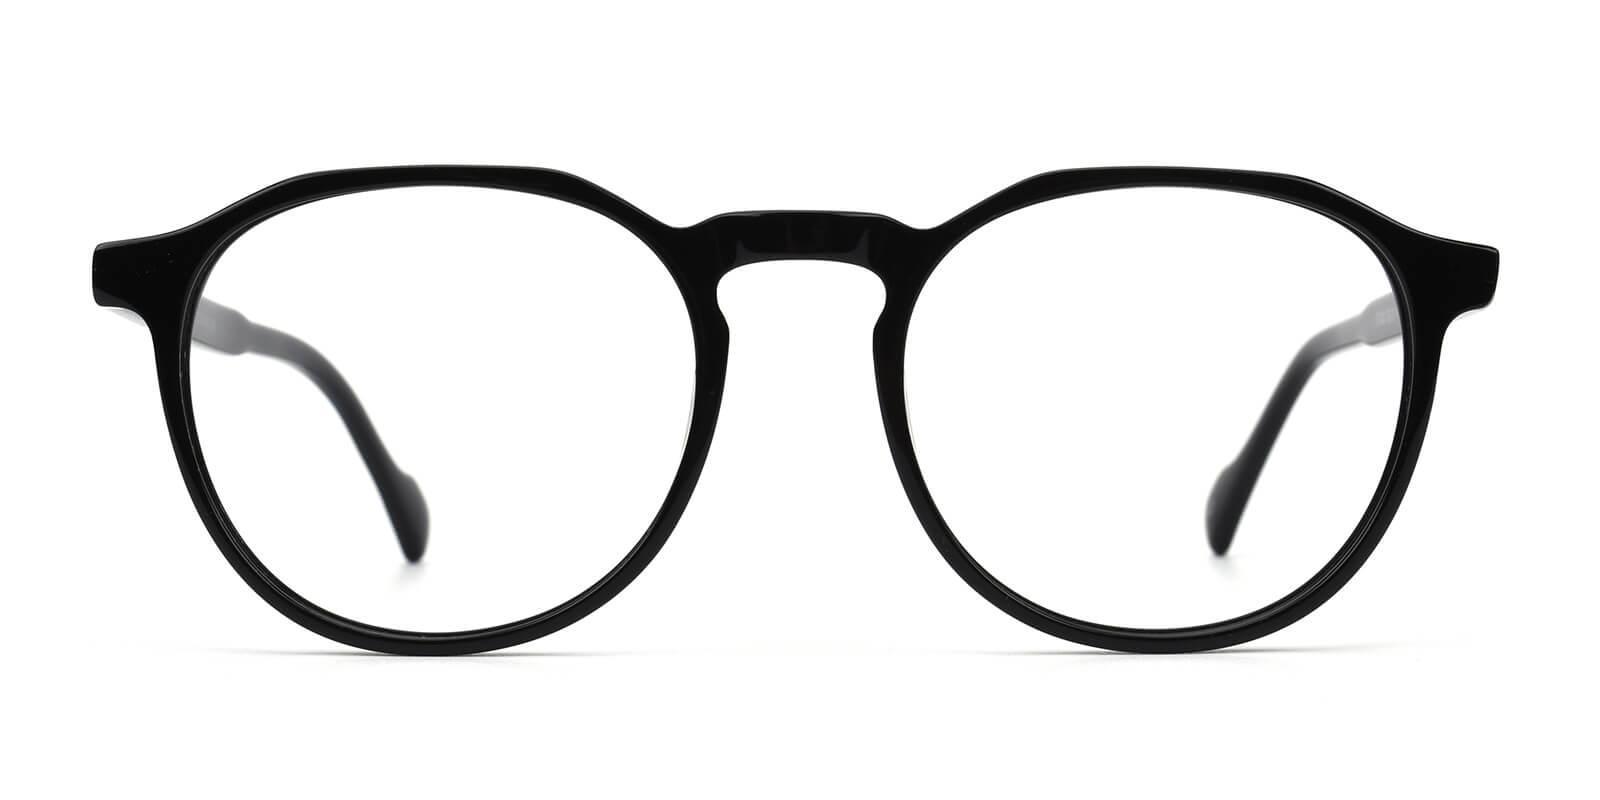 Merimis-Black-Round-TR-Eyeglasses-additional2